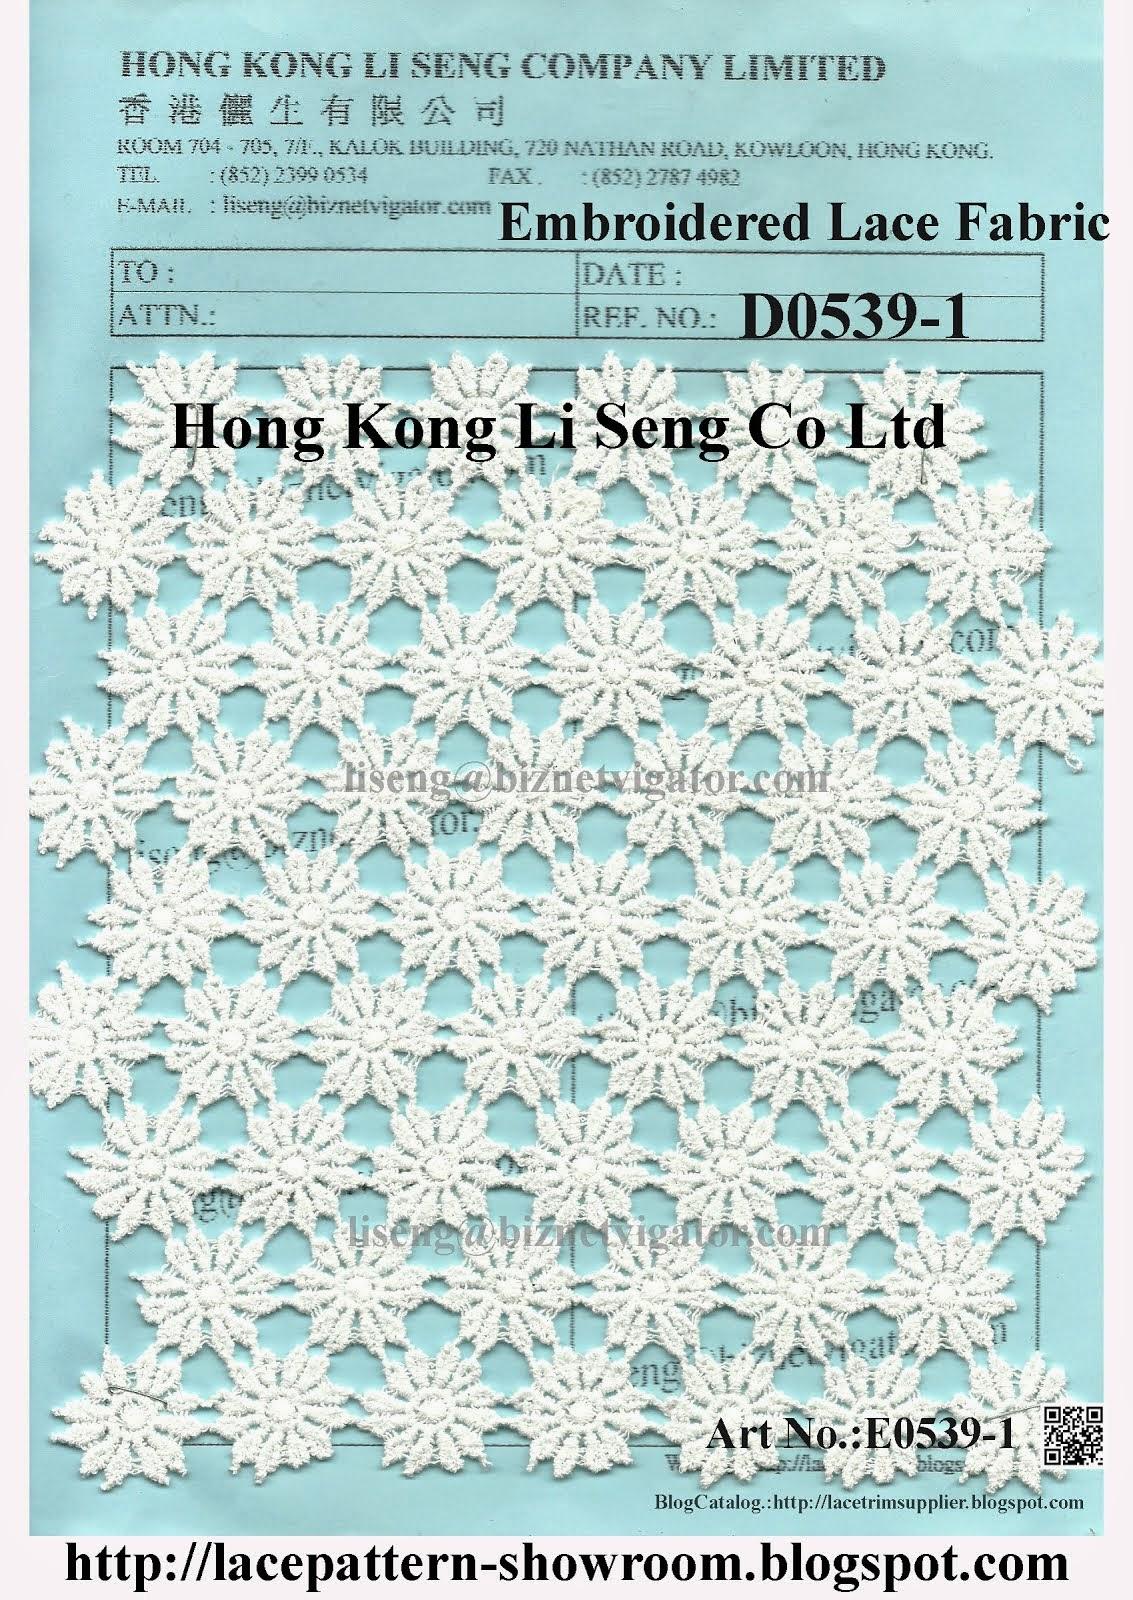 Embroidered Cotton Lace Fabric Factory - Hong Kong Li Seng Co Ltd